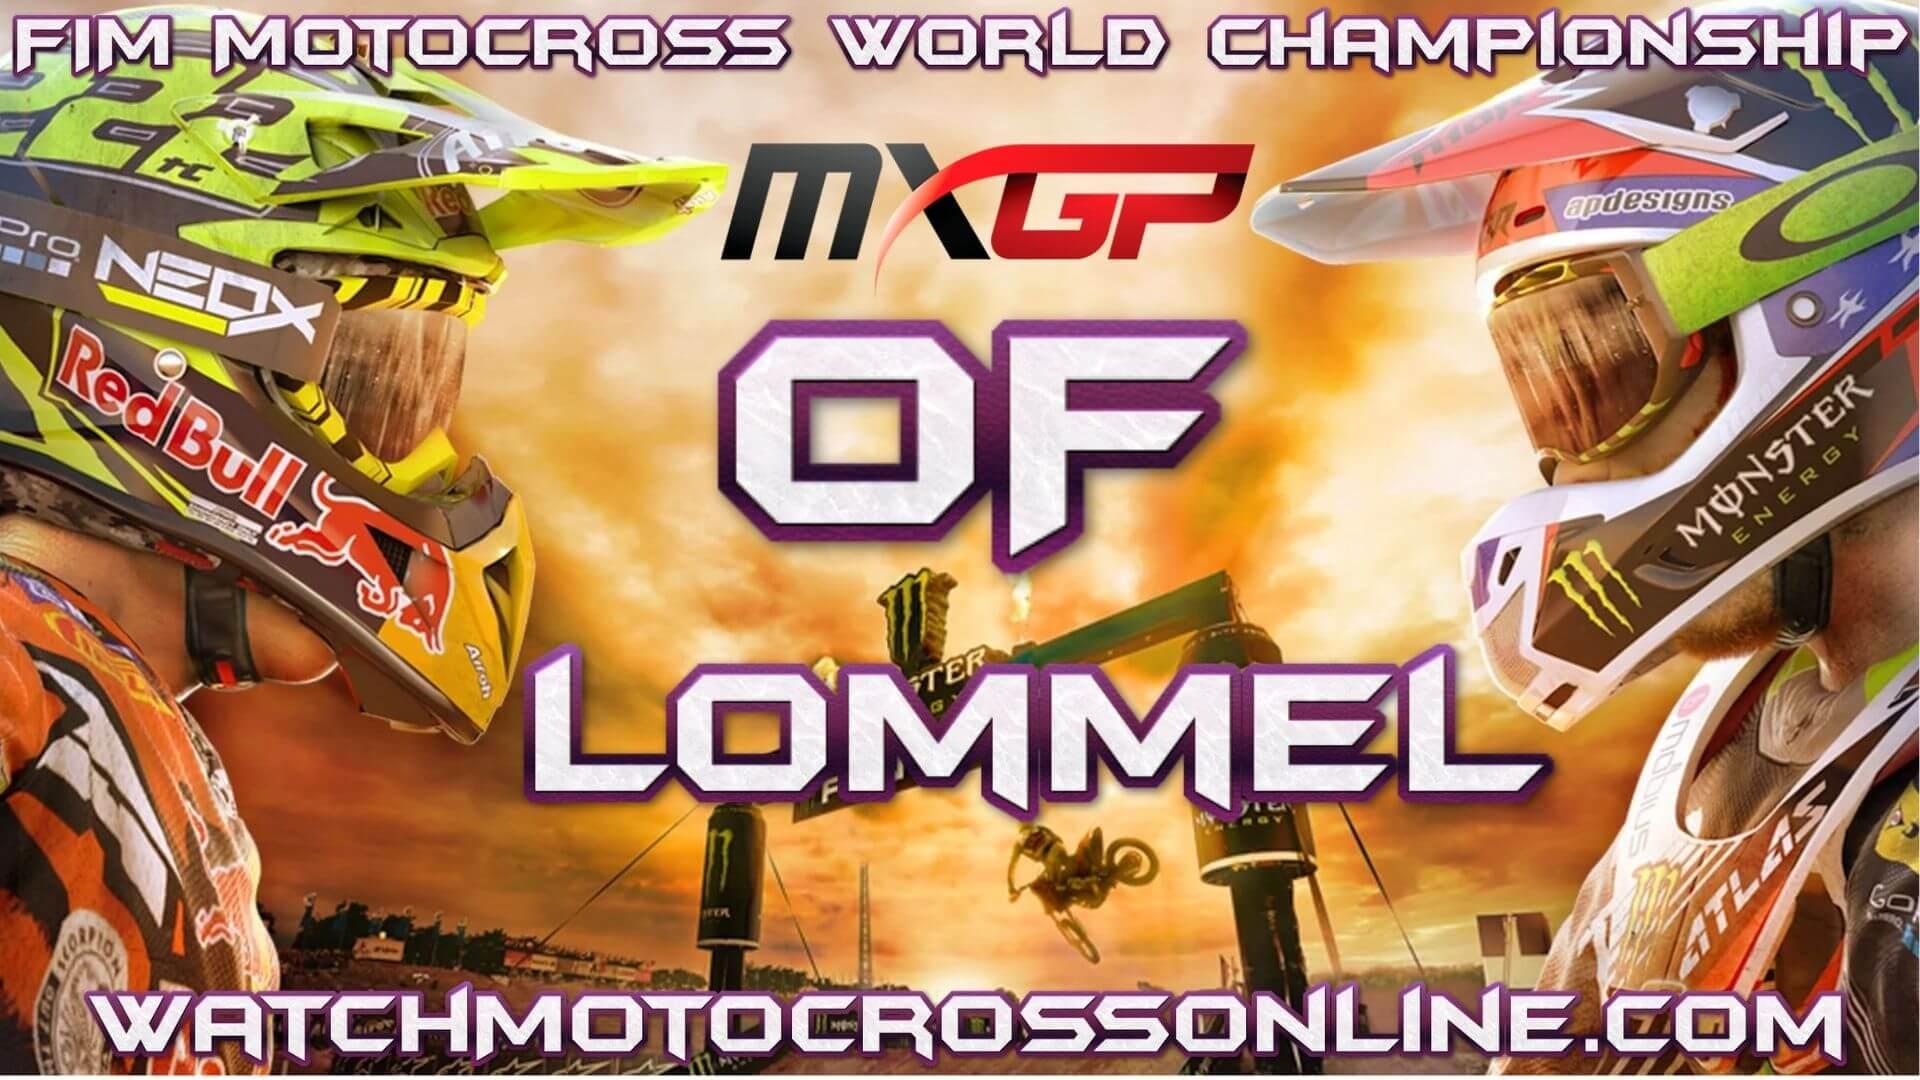 MXGP Of Lommel Live Stream 2020